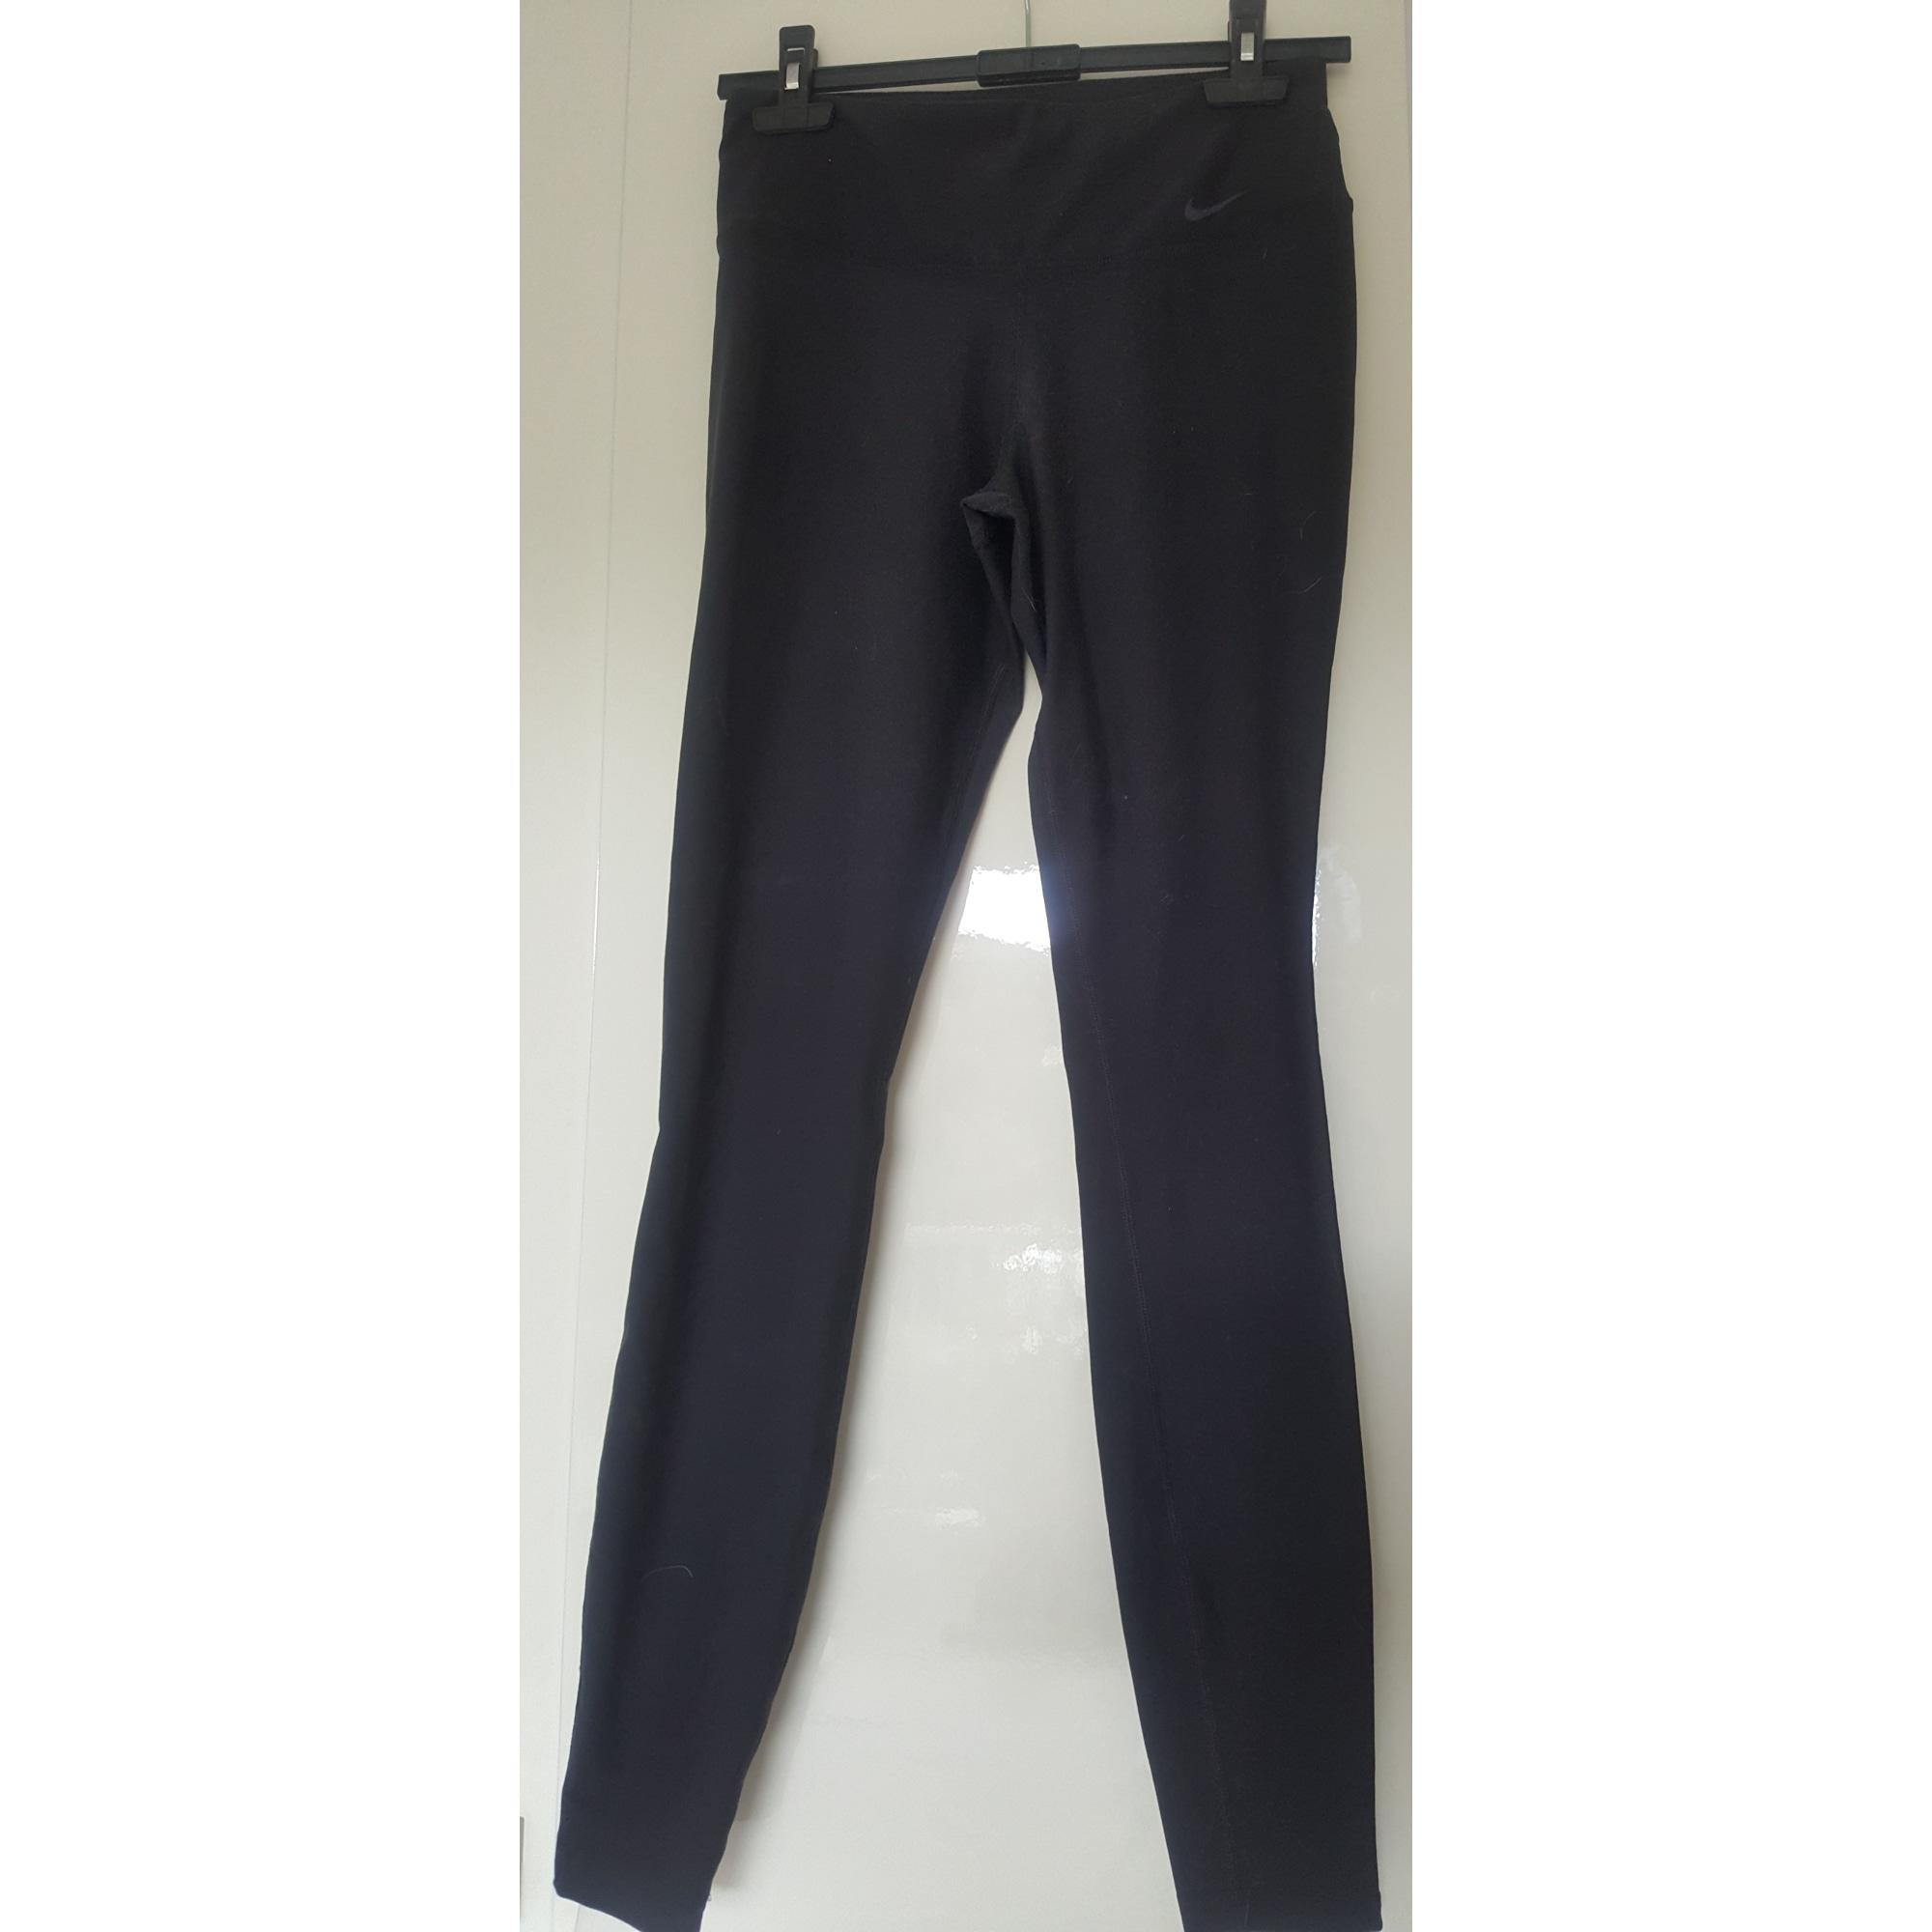 Pantalon slim, cigarette NIKE Noir